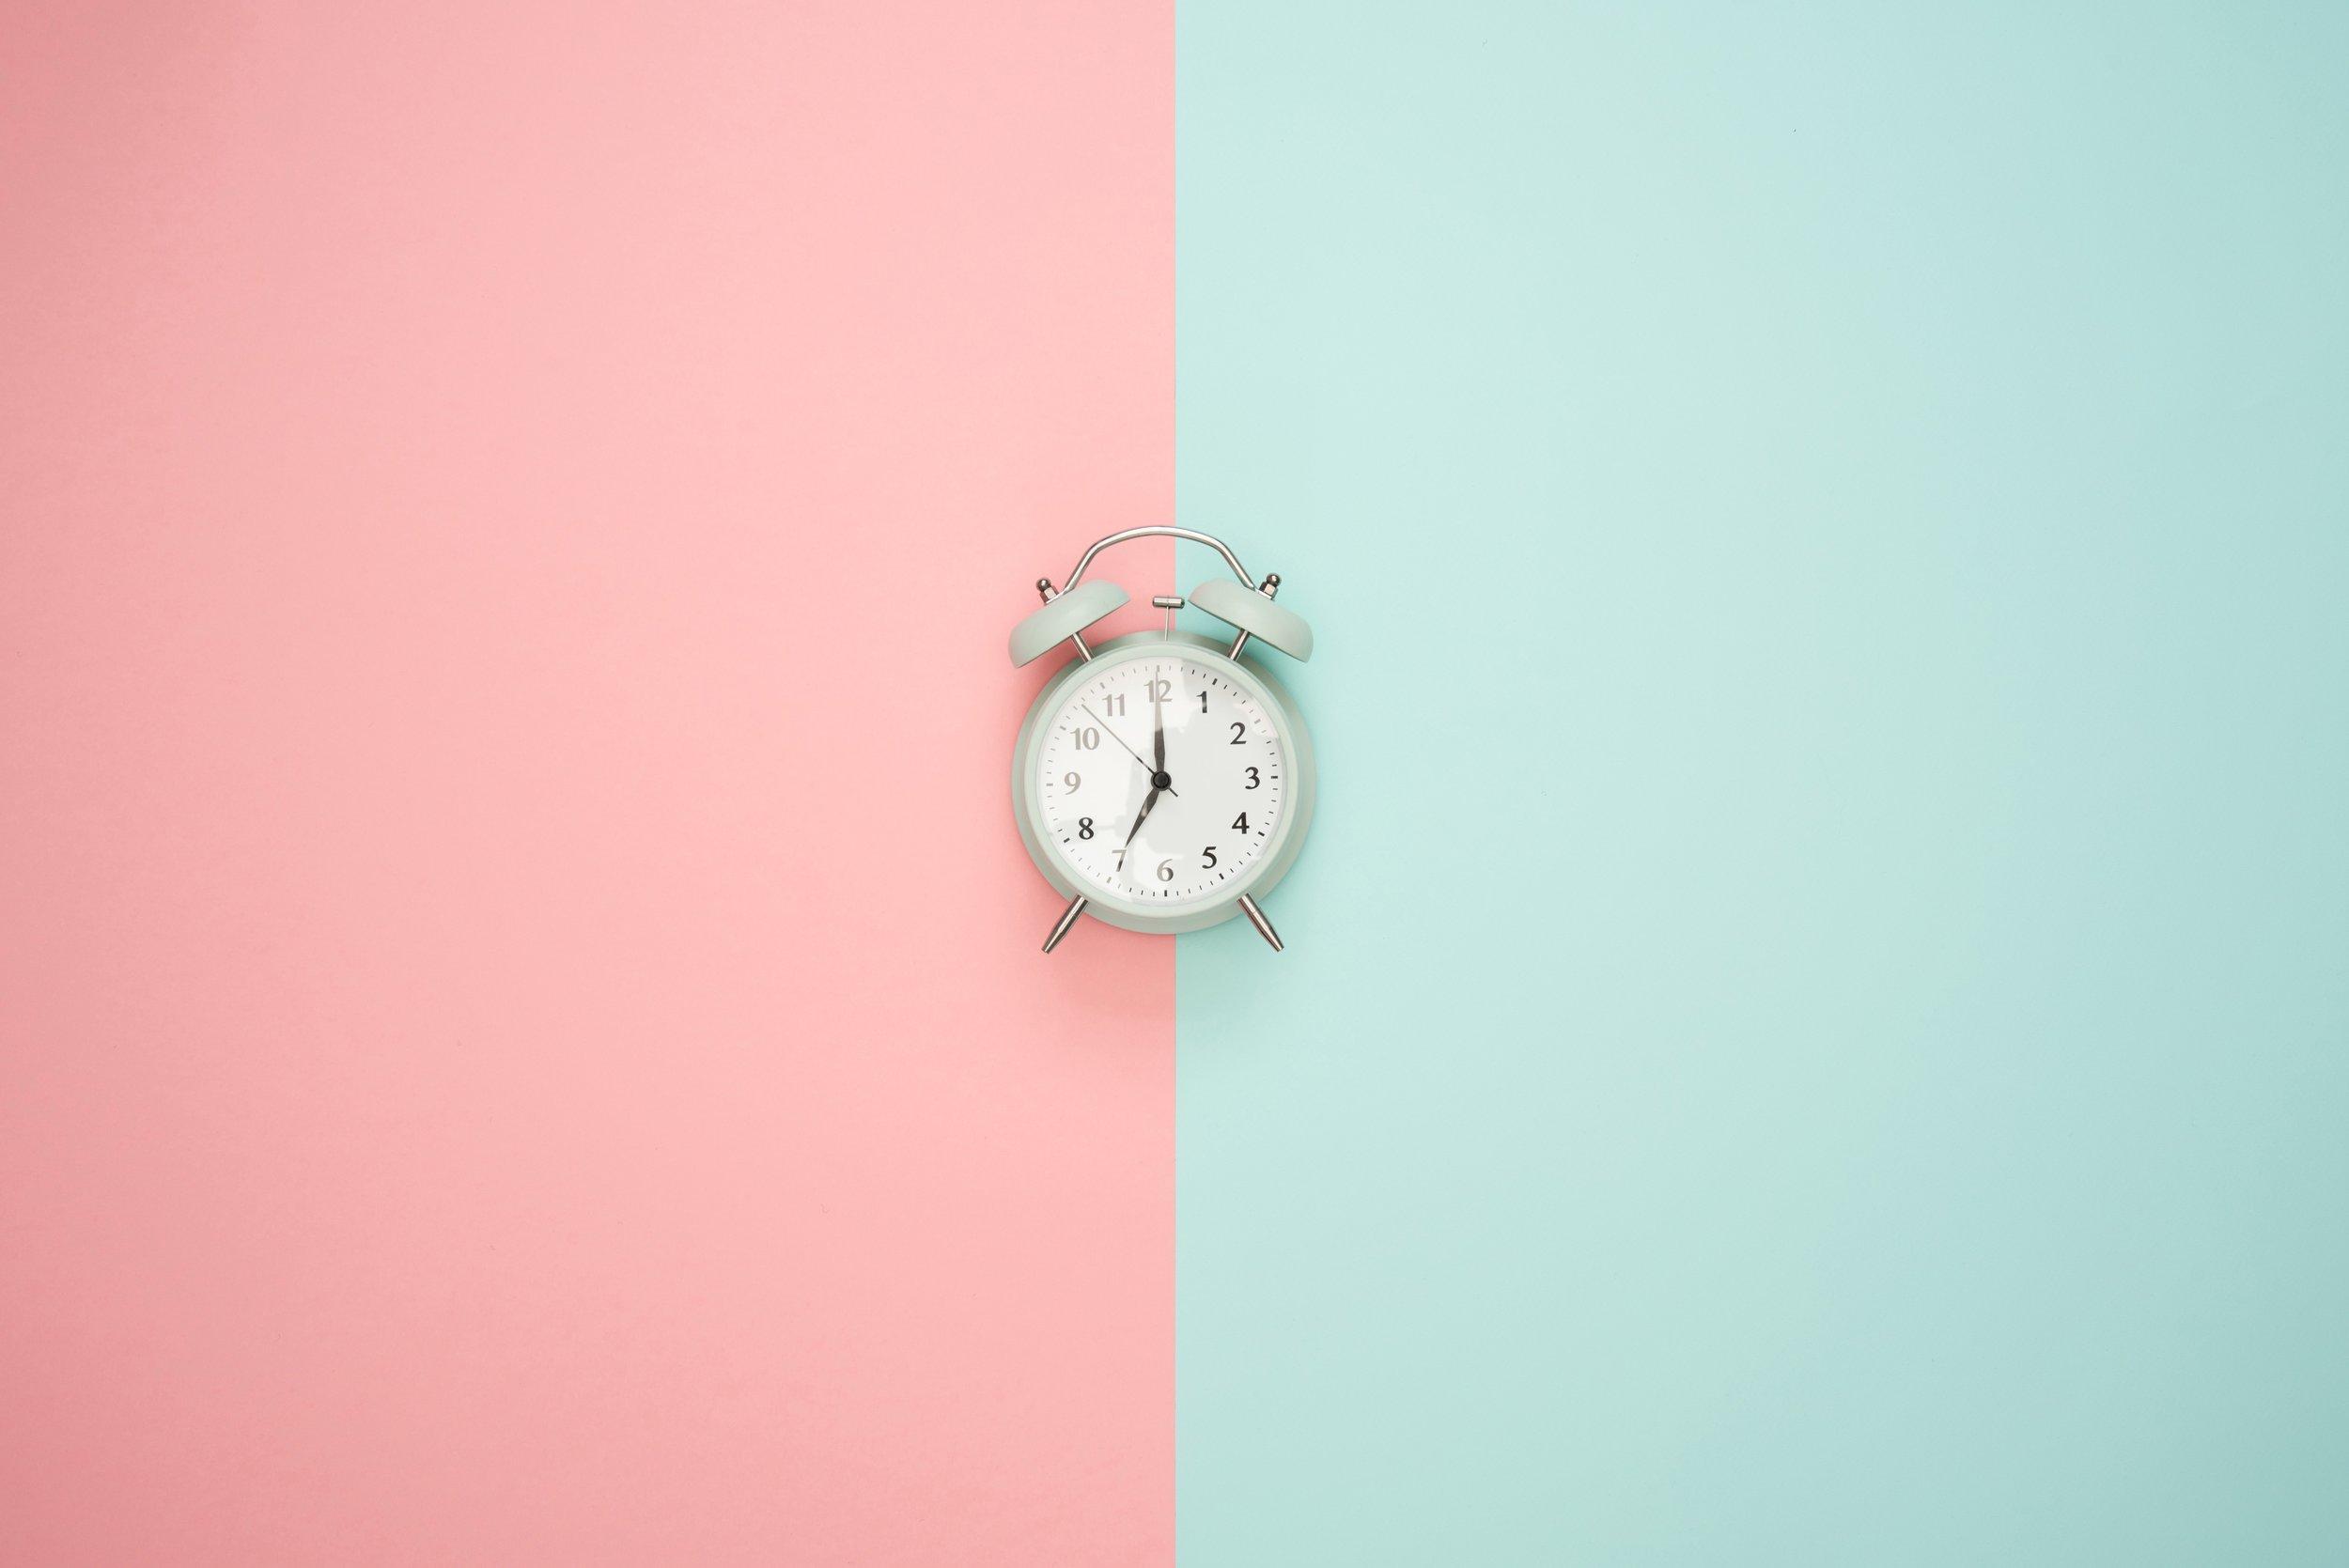 alarm-clock-art-background-1037993 (1)-1.jpg